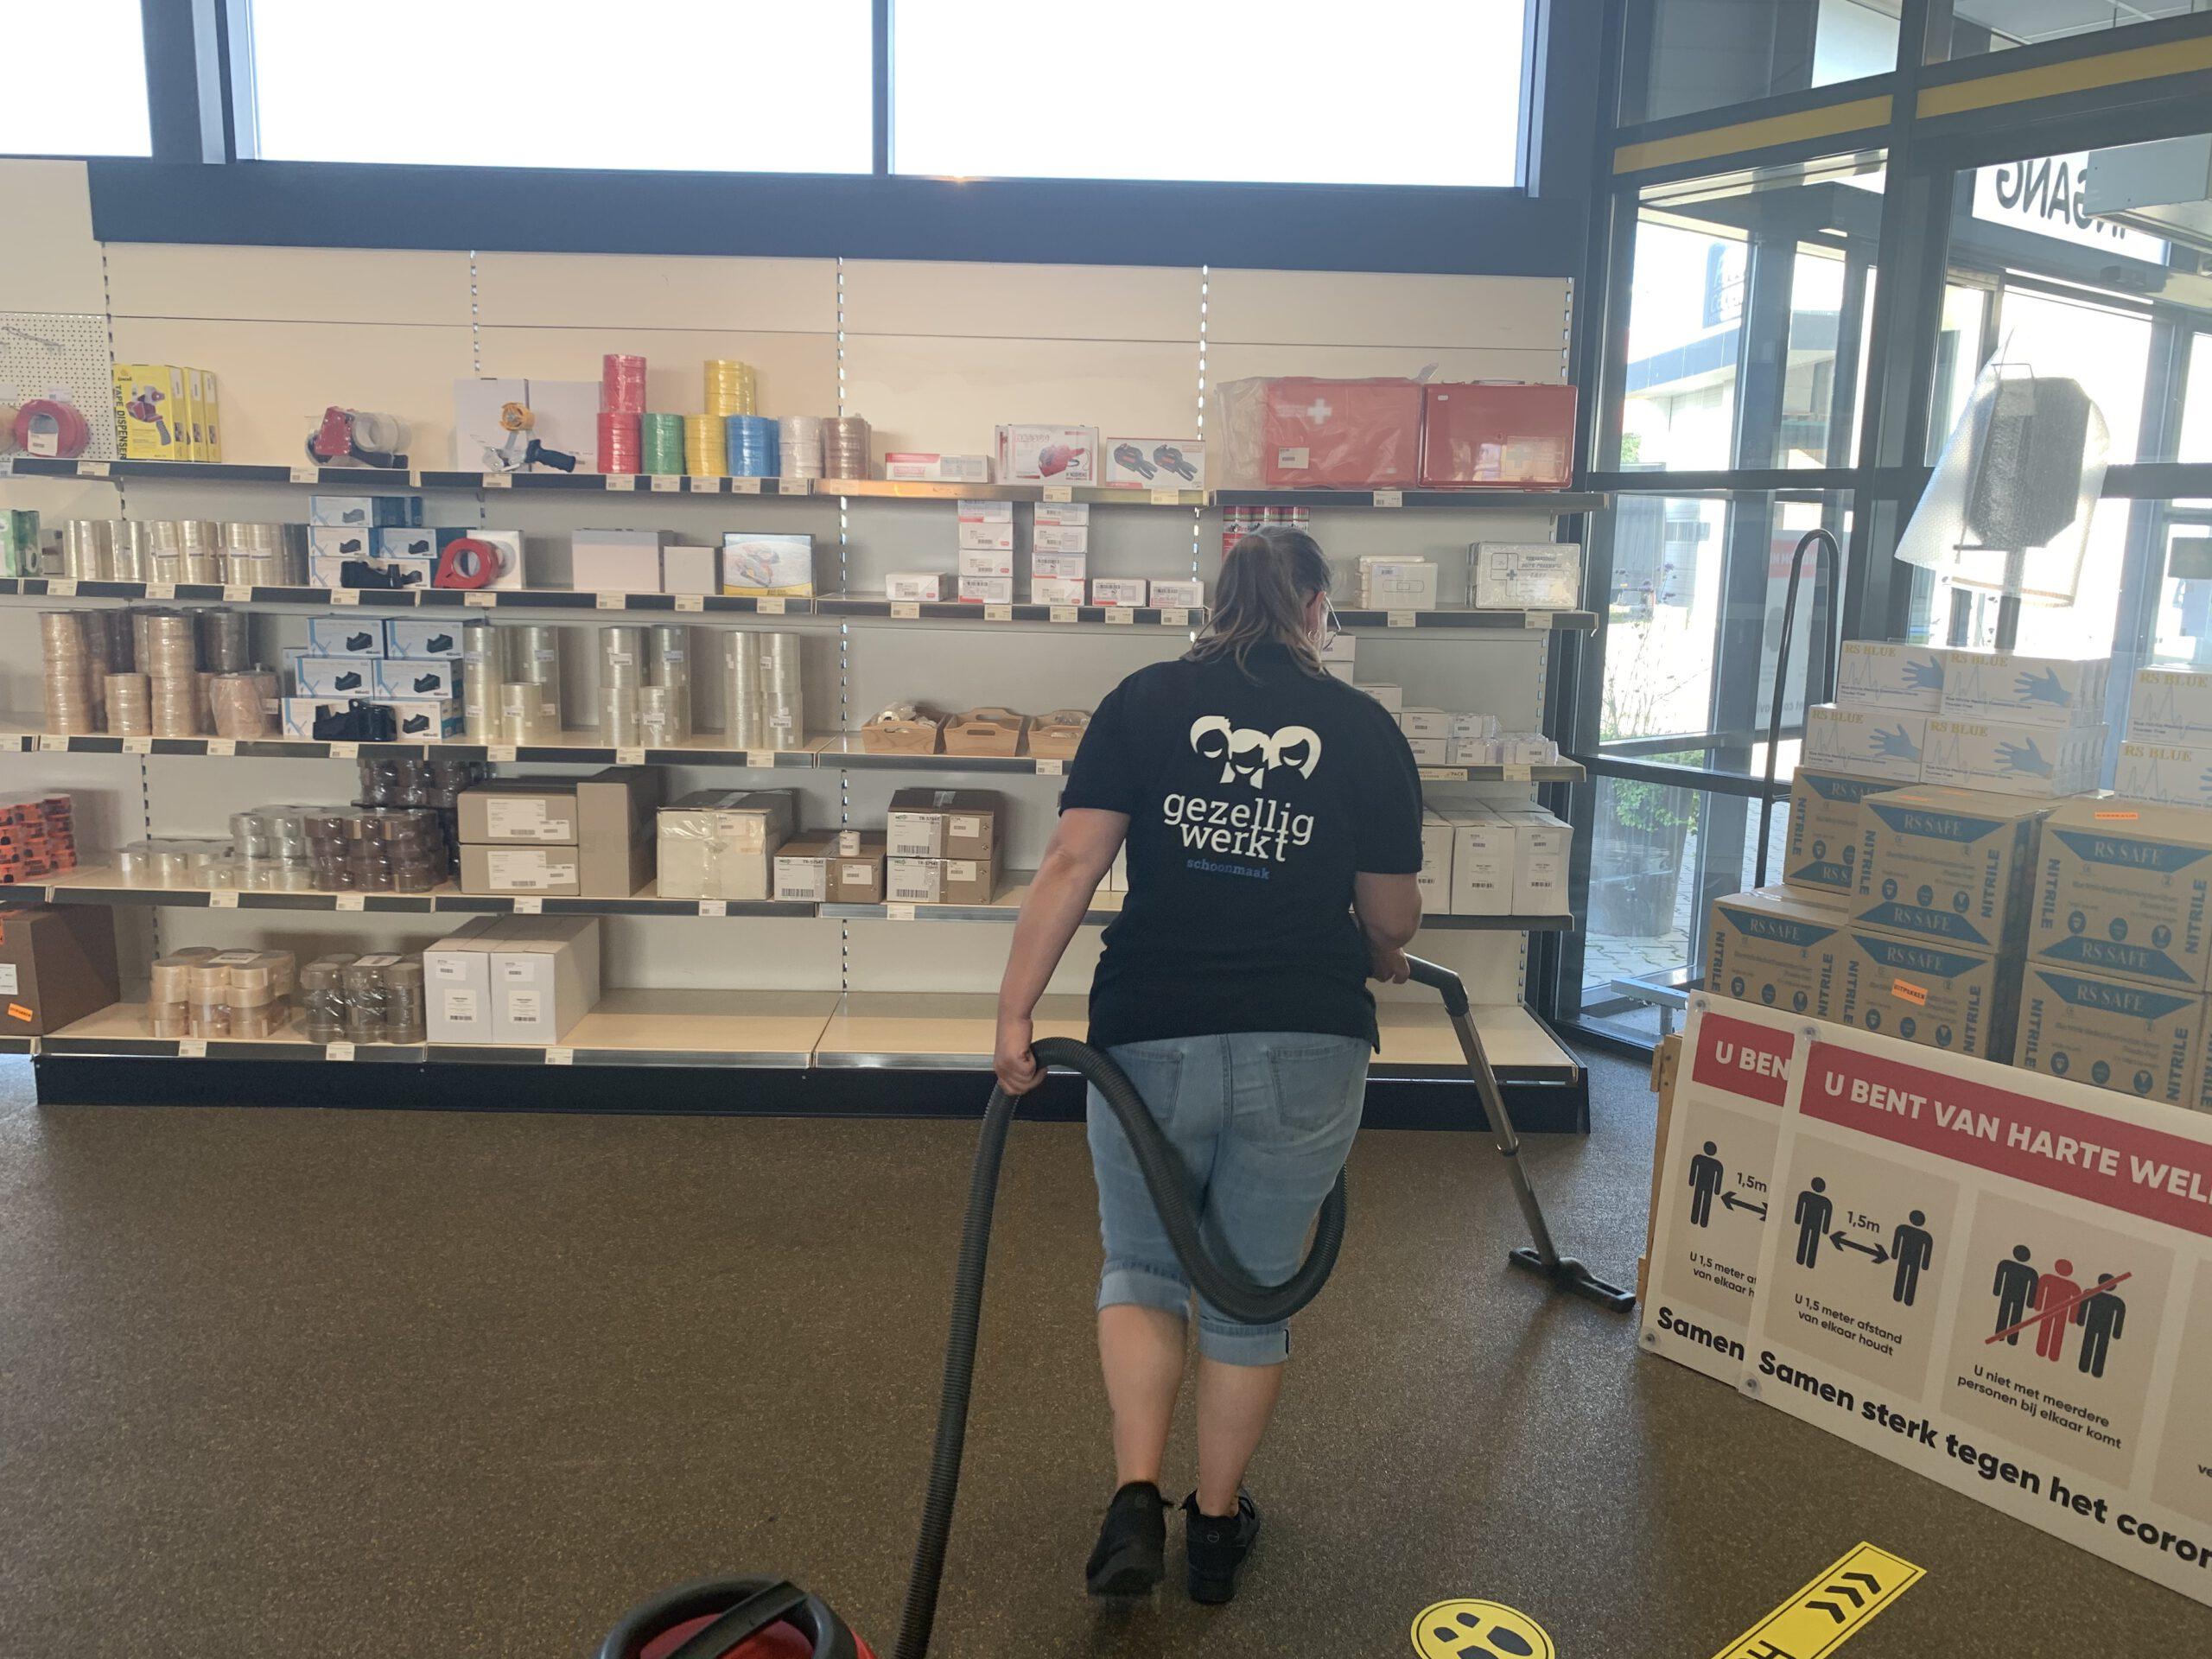 vloer schoonmaak in winkels